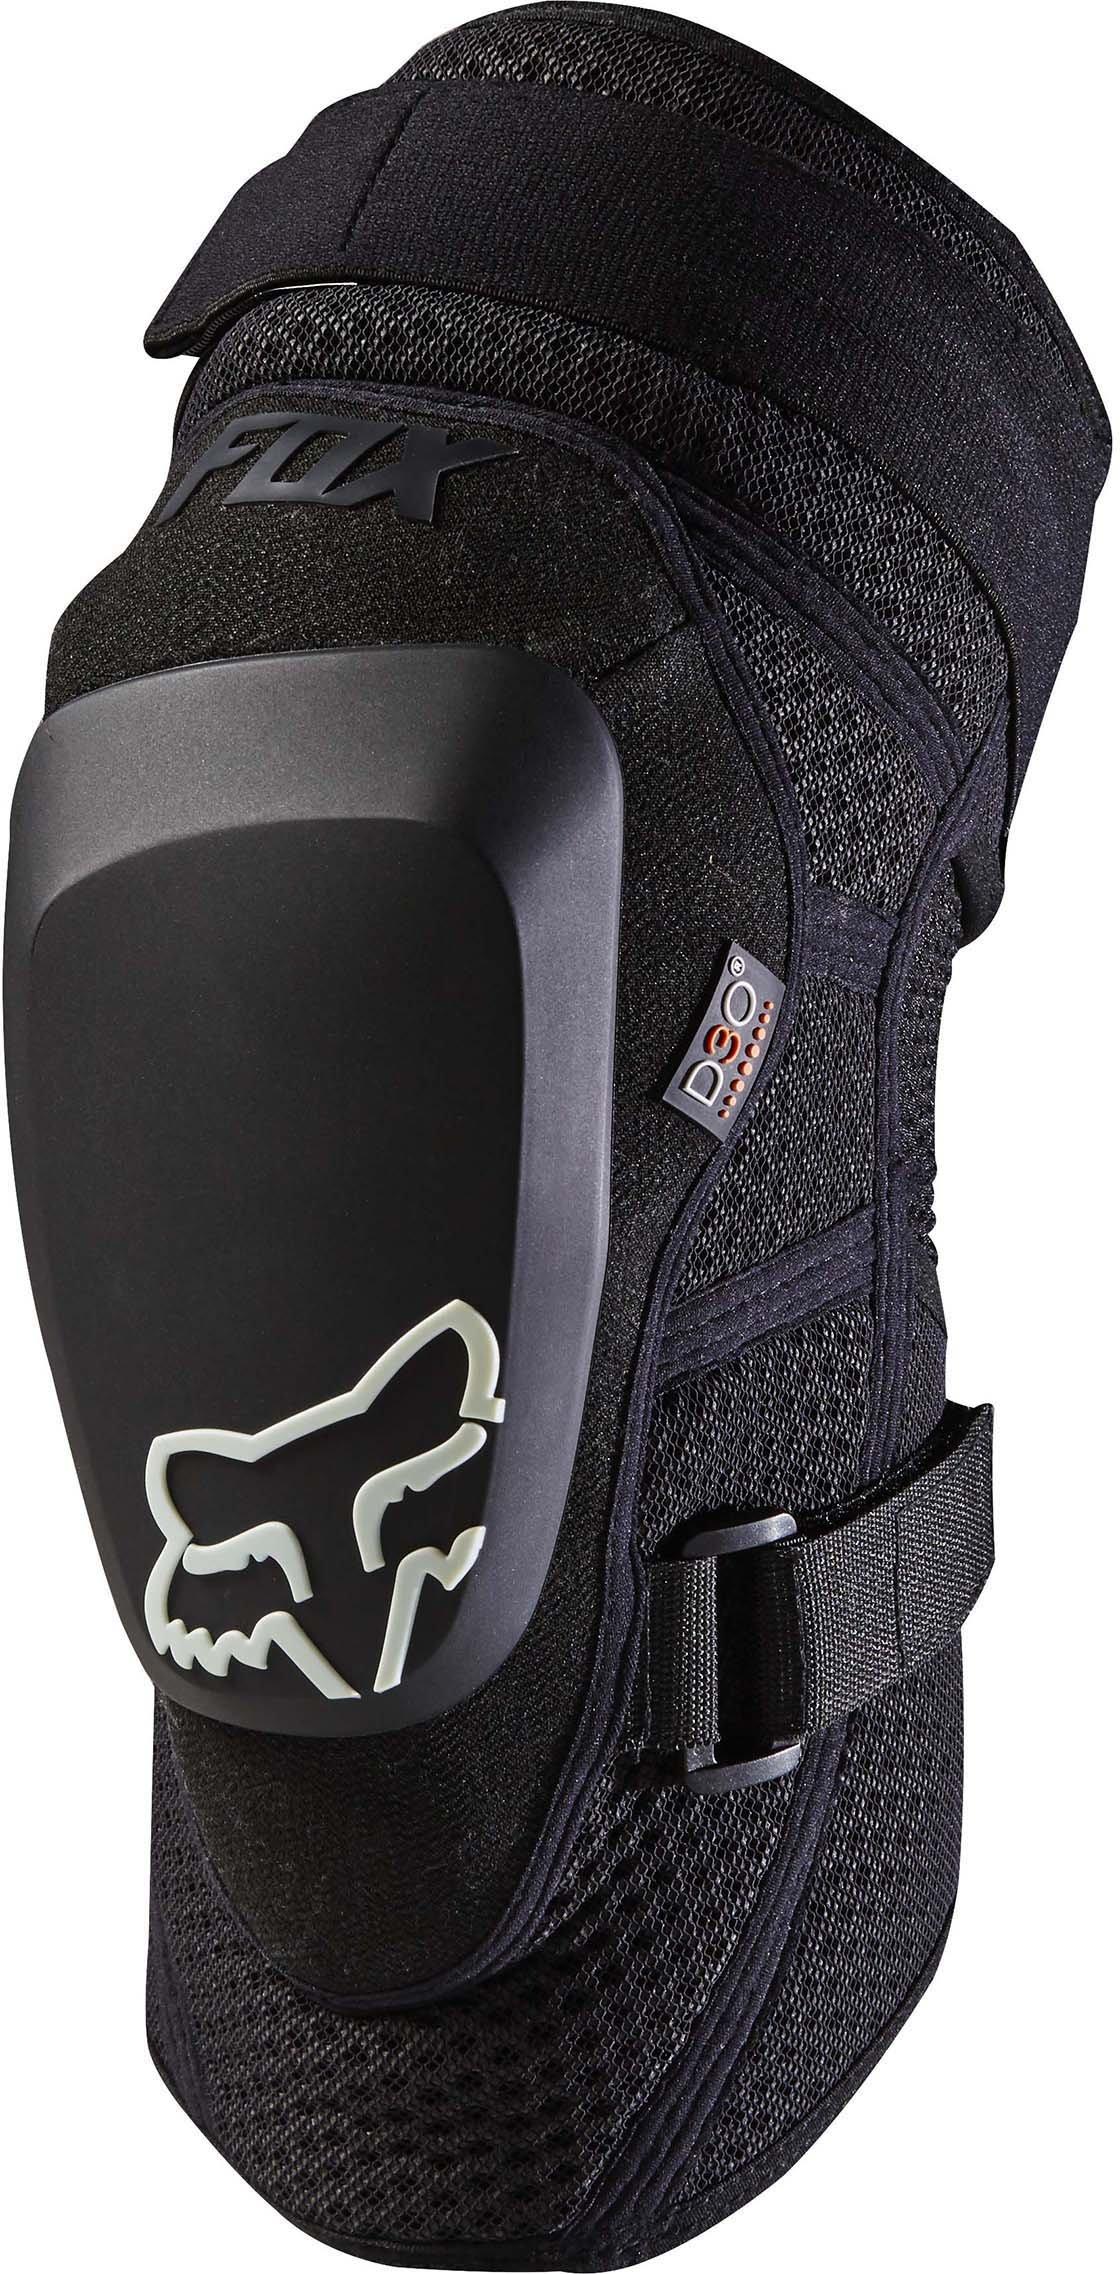 Fox Racing Launch Pro D3O Knee Guard Black, L